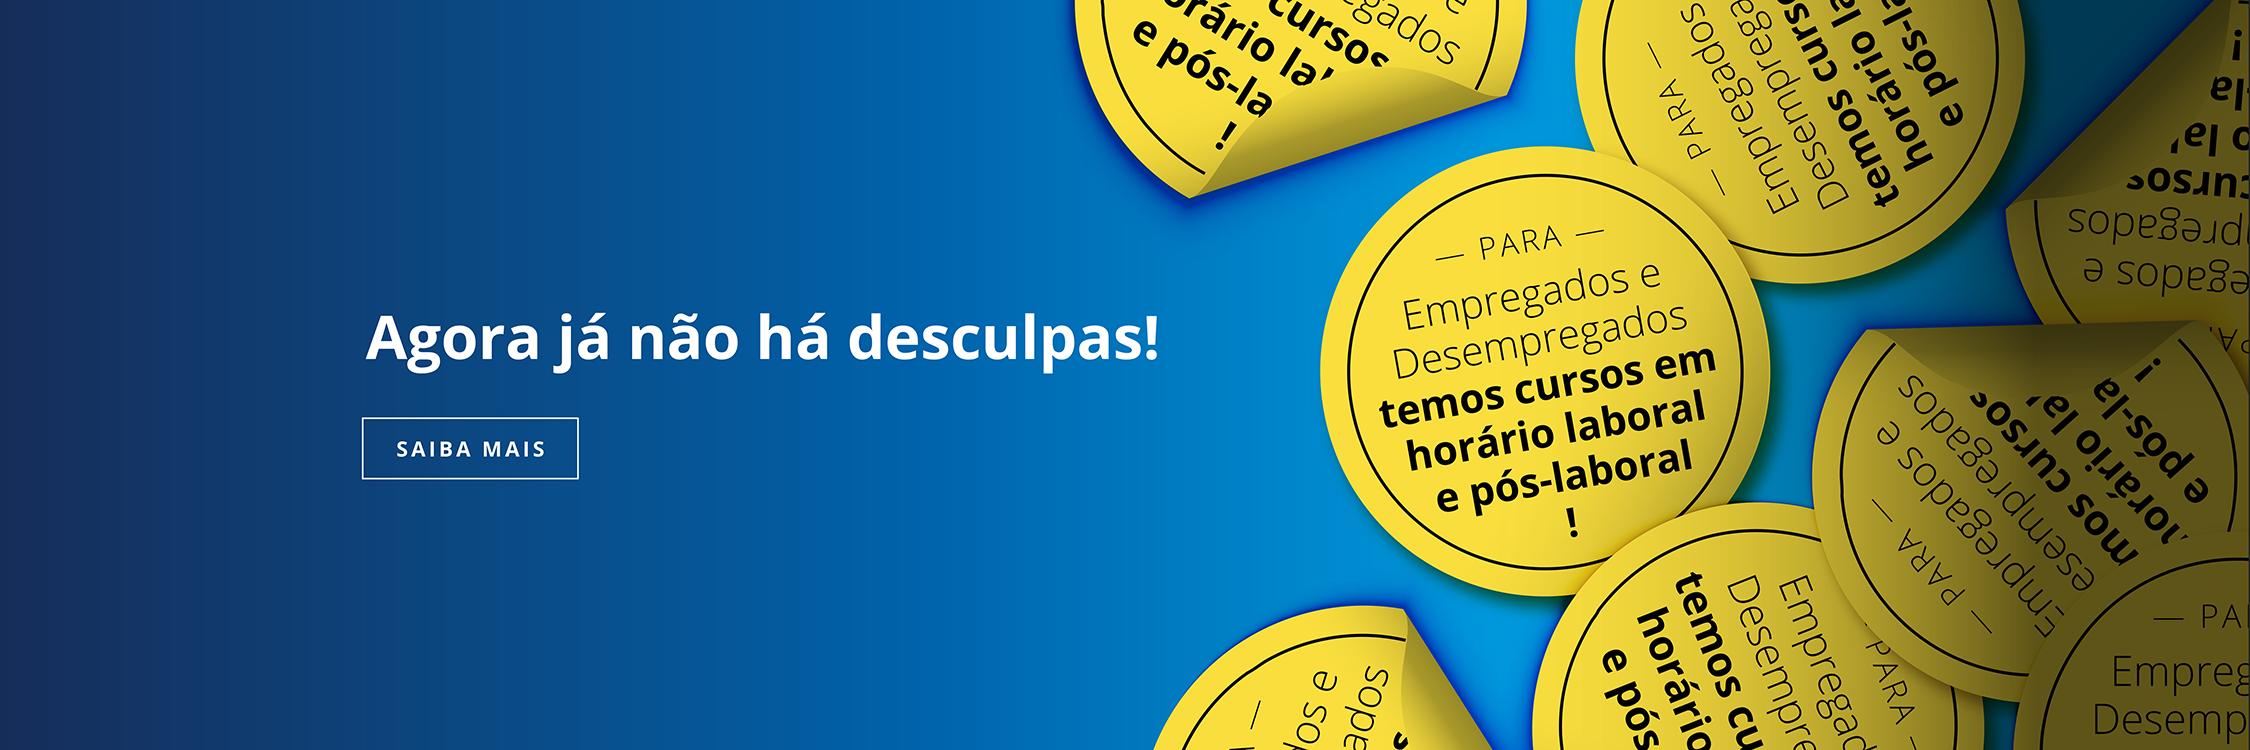 Banner-website_CampanhaPosLaboral_Empregado